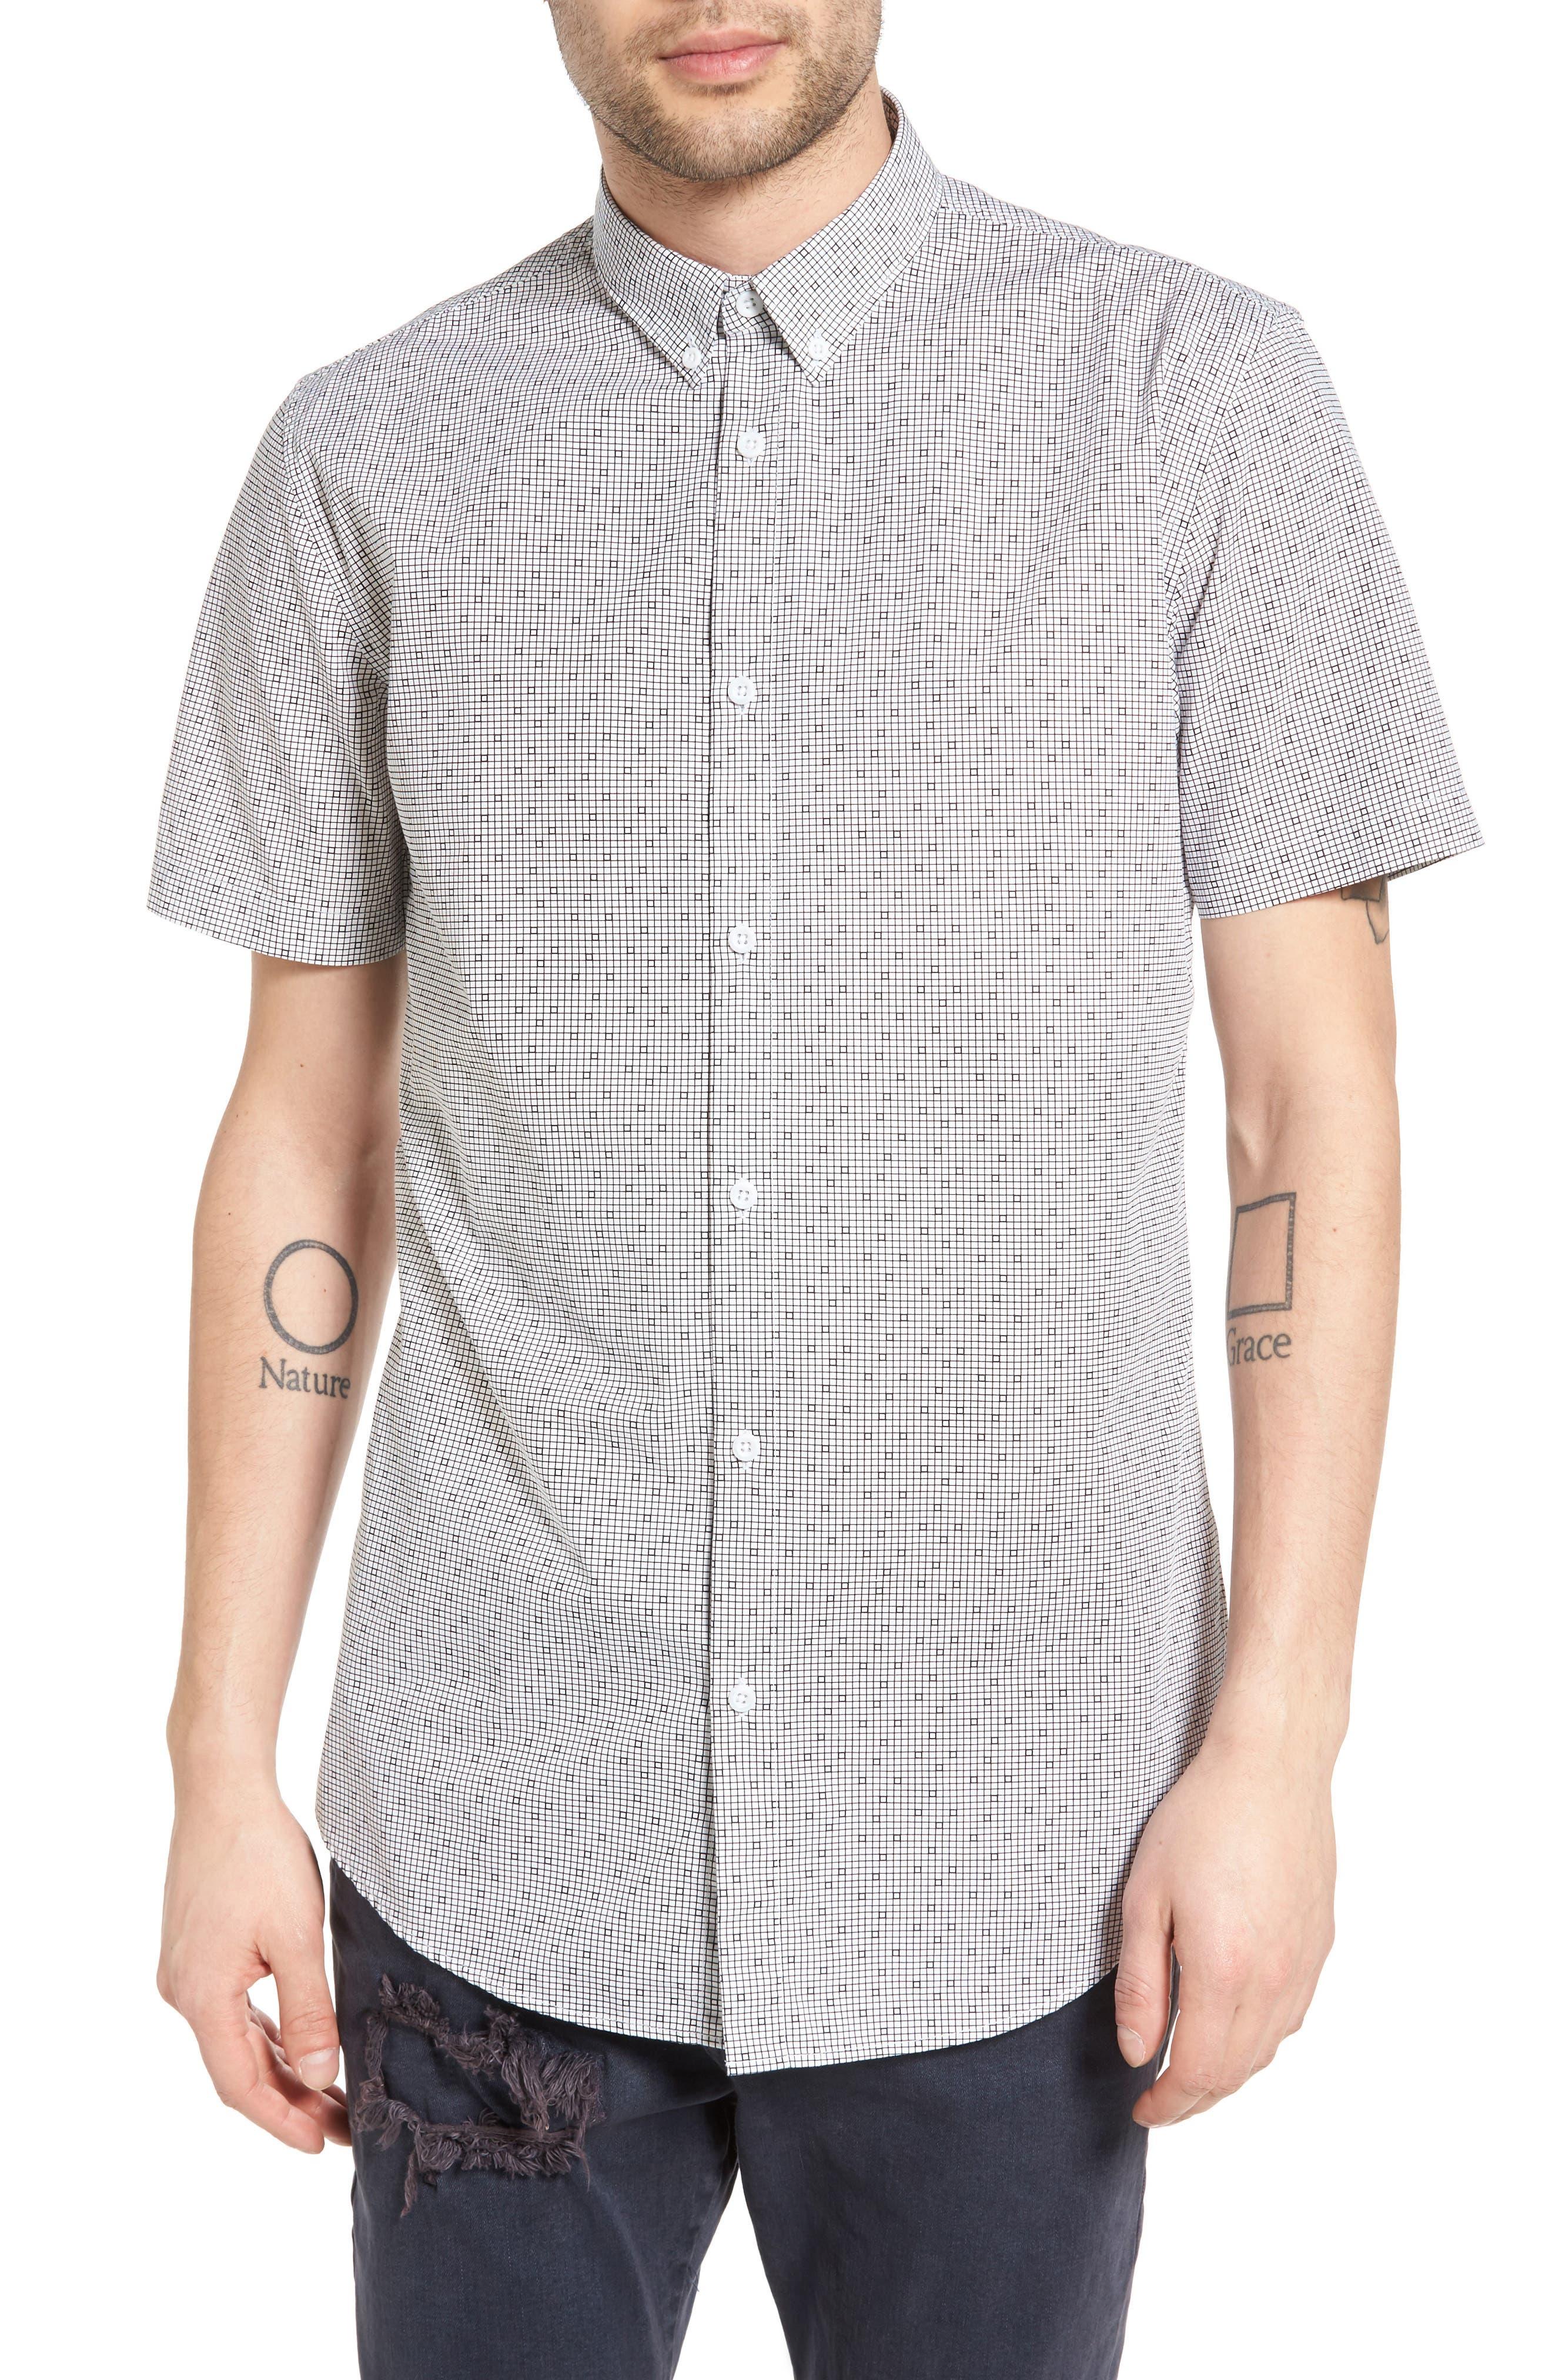 ZANEROBE 8-Bit 7 Ft Woven Shirt